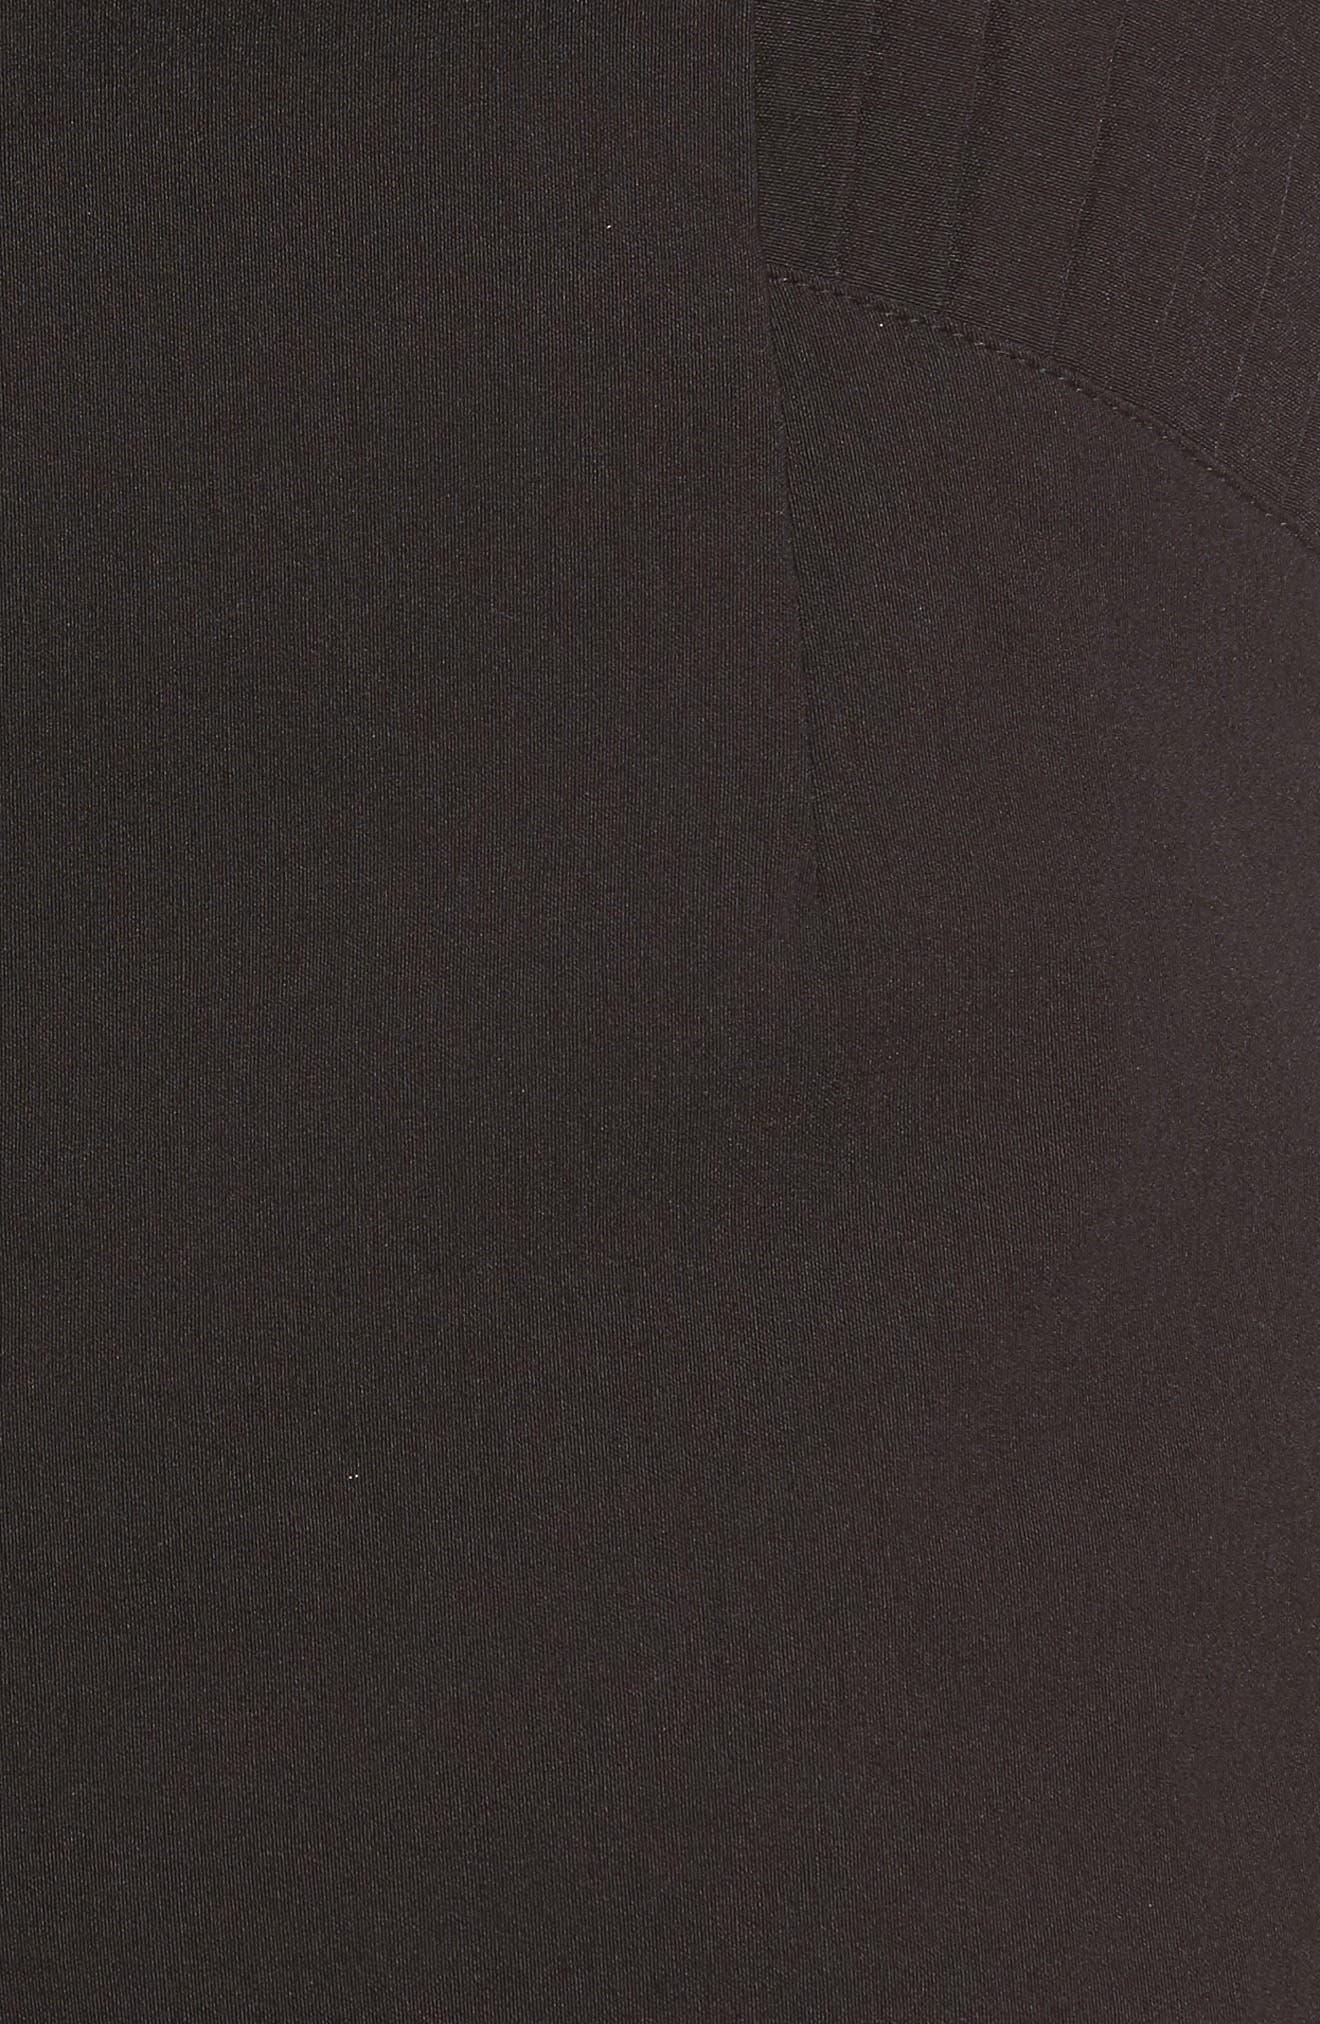 Pleat Trim High Waist Shorts,                             Alternate thumbnail 5, color,                             001